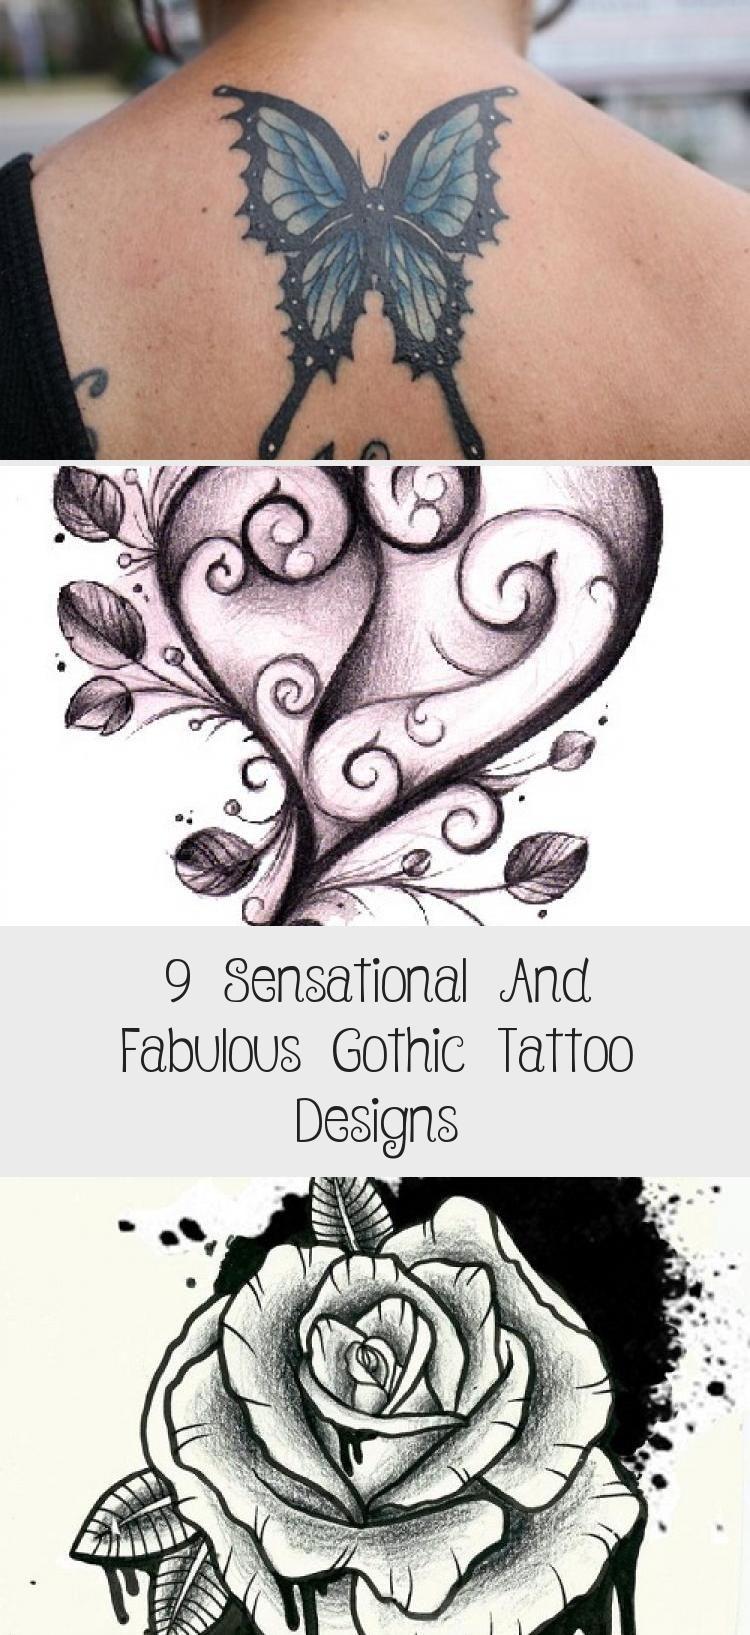 Gothic Heart Tattoo : gothic, heart, tattoo, Impressive, Gothic, Heart, Tattoo, Design, #hearttattooOutline, #hearttattooSketch, #hearttattooWithWords, #hearttattoo…, Designs,, Tattoos,